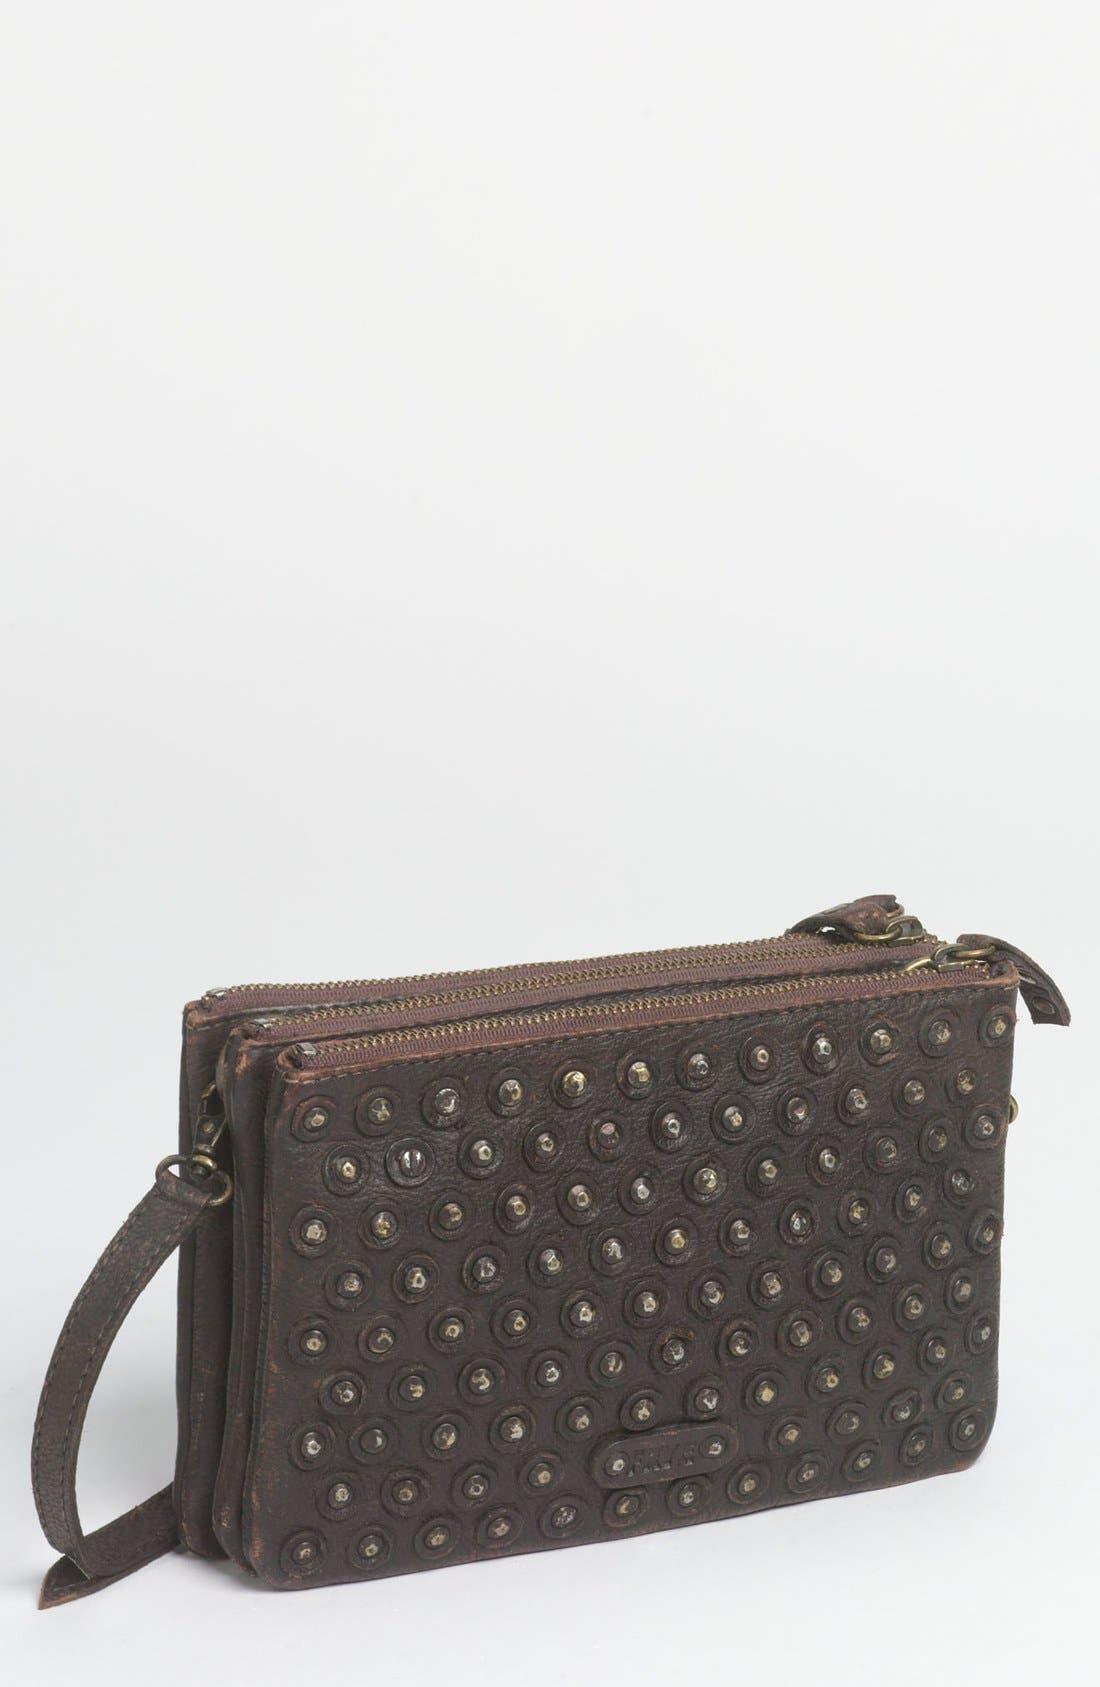 Alternate Image 1 Selected - Frye 'Jenna' Crossbody Bag, Small